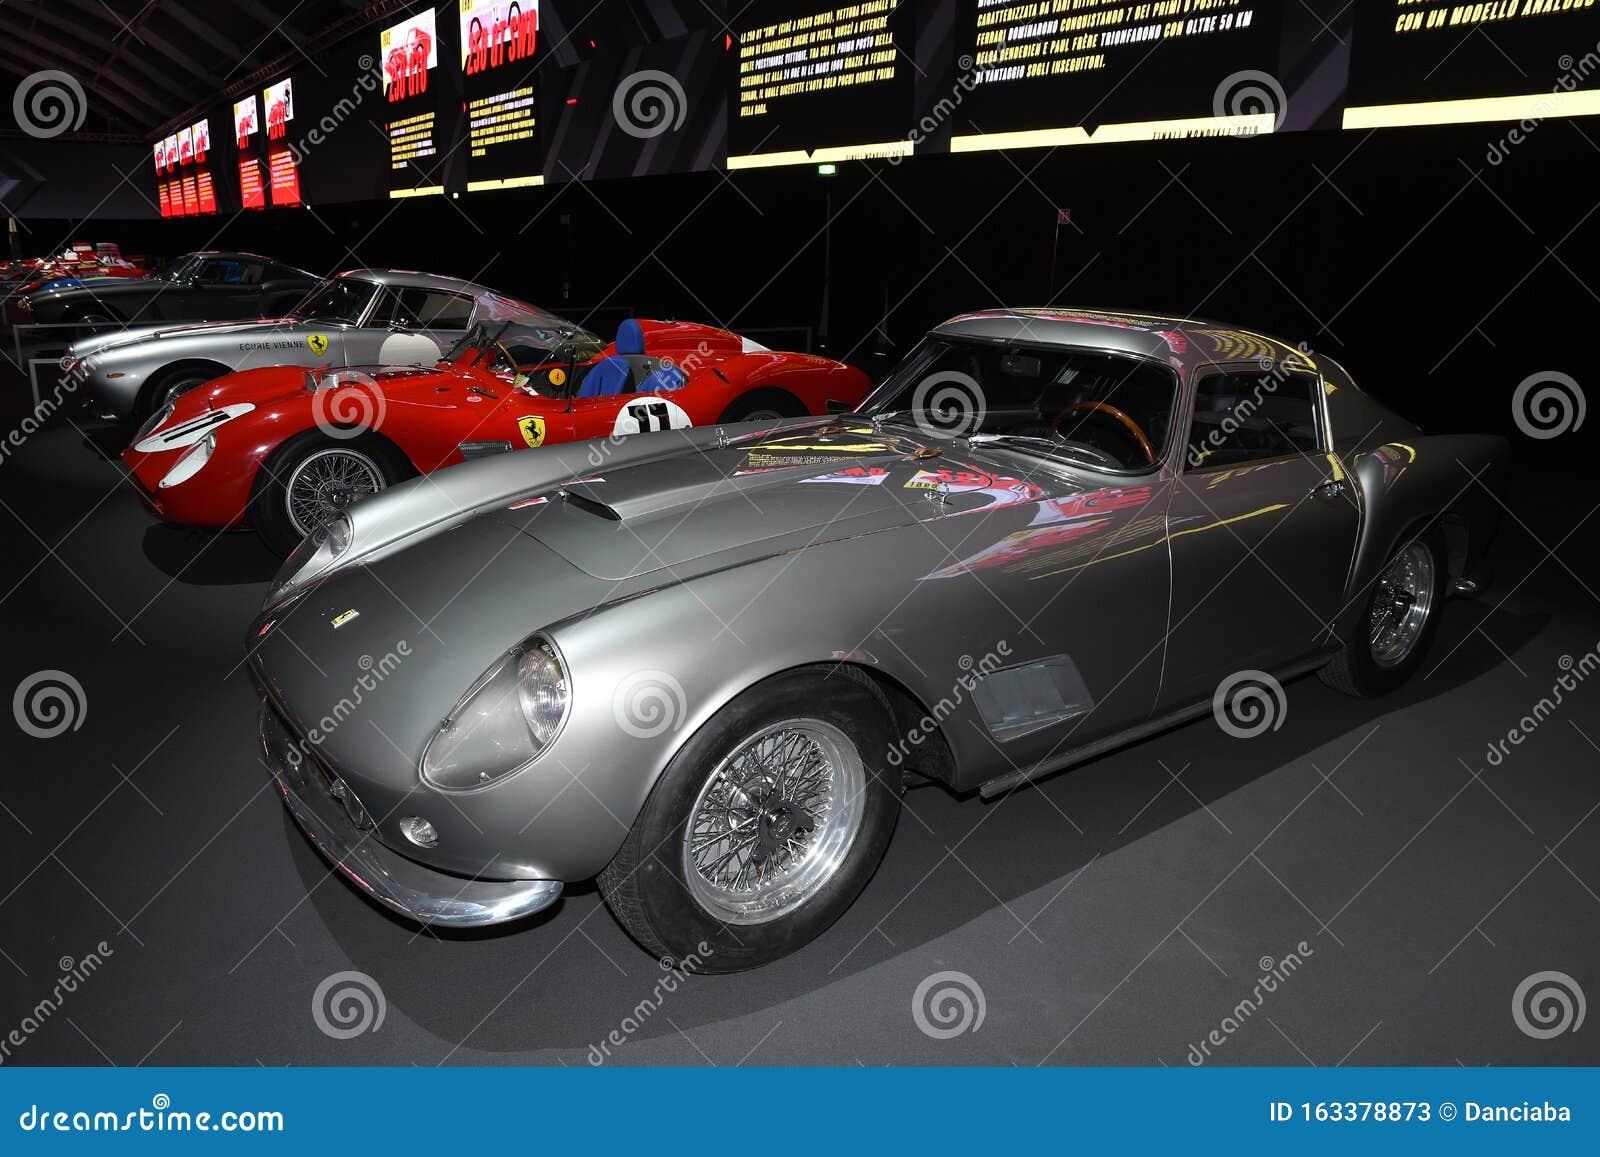 Mugello Circuit 25 October 2019 Vintage Ferrari 250 Gt Lwb Ecurie Vienne Year 1955 On Display During Finali Mondiali Ferrari Editorial Stock Photo Image Of Ferrari Historic 163378873